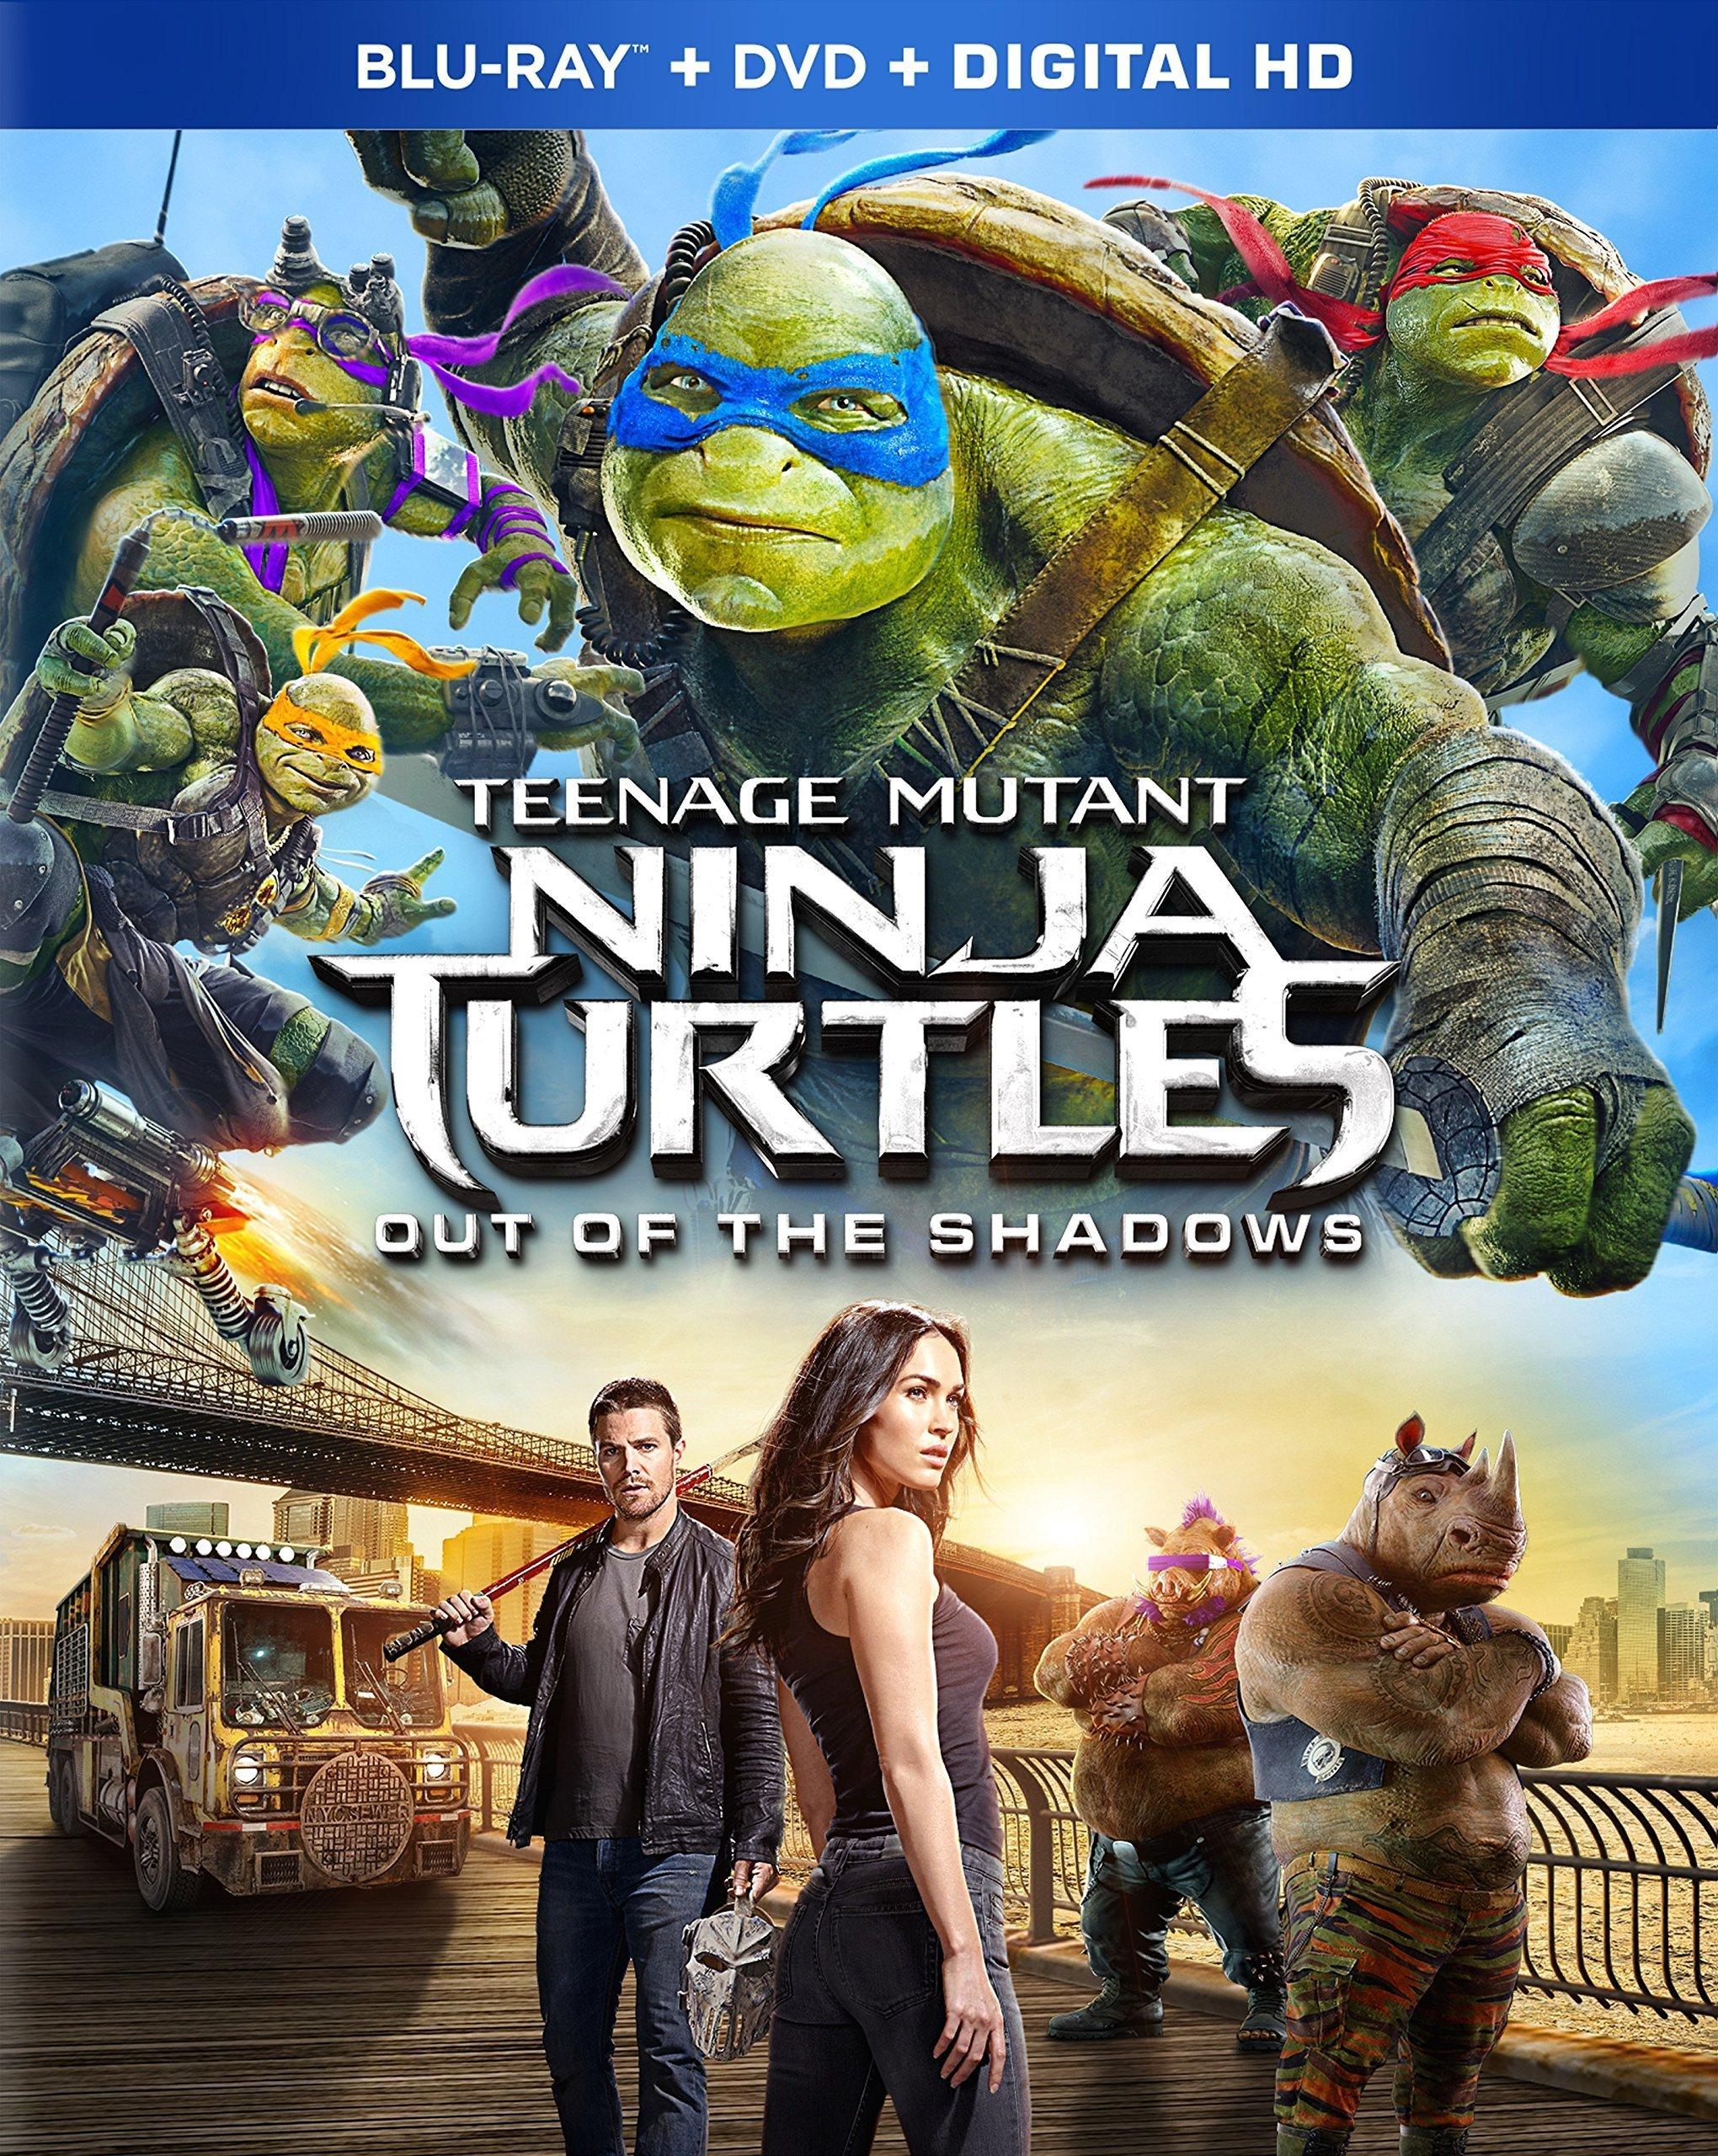 Teenage Mutant Ninja Turtles: Out of the Shadows (2016) poster image